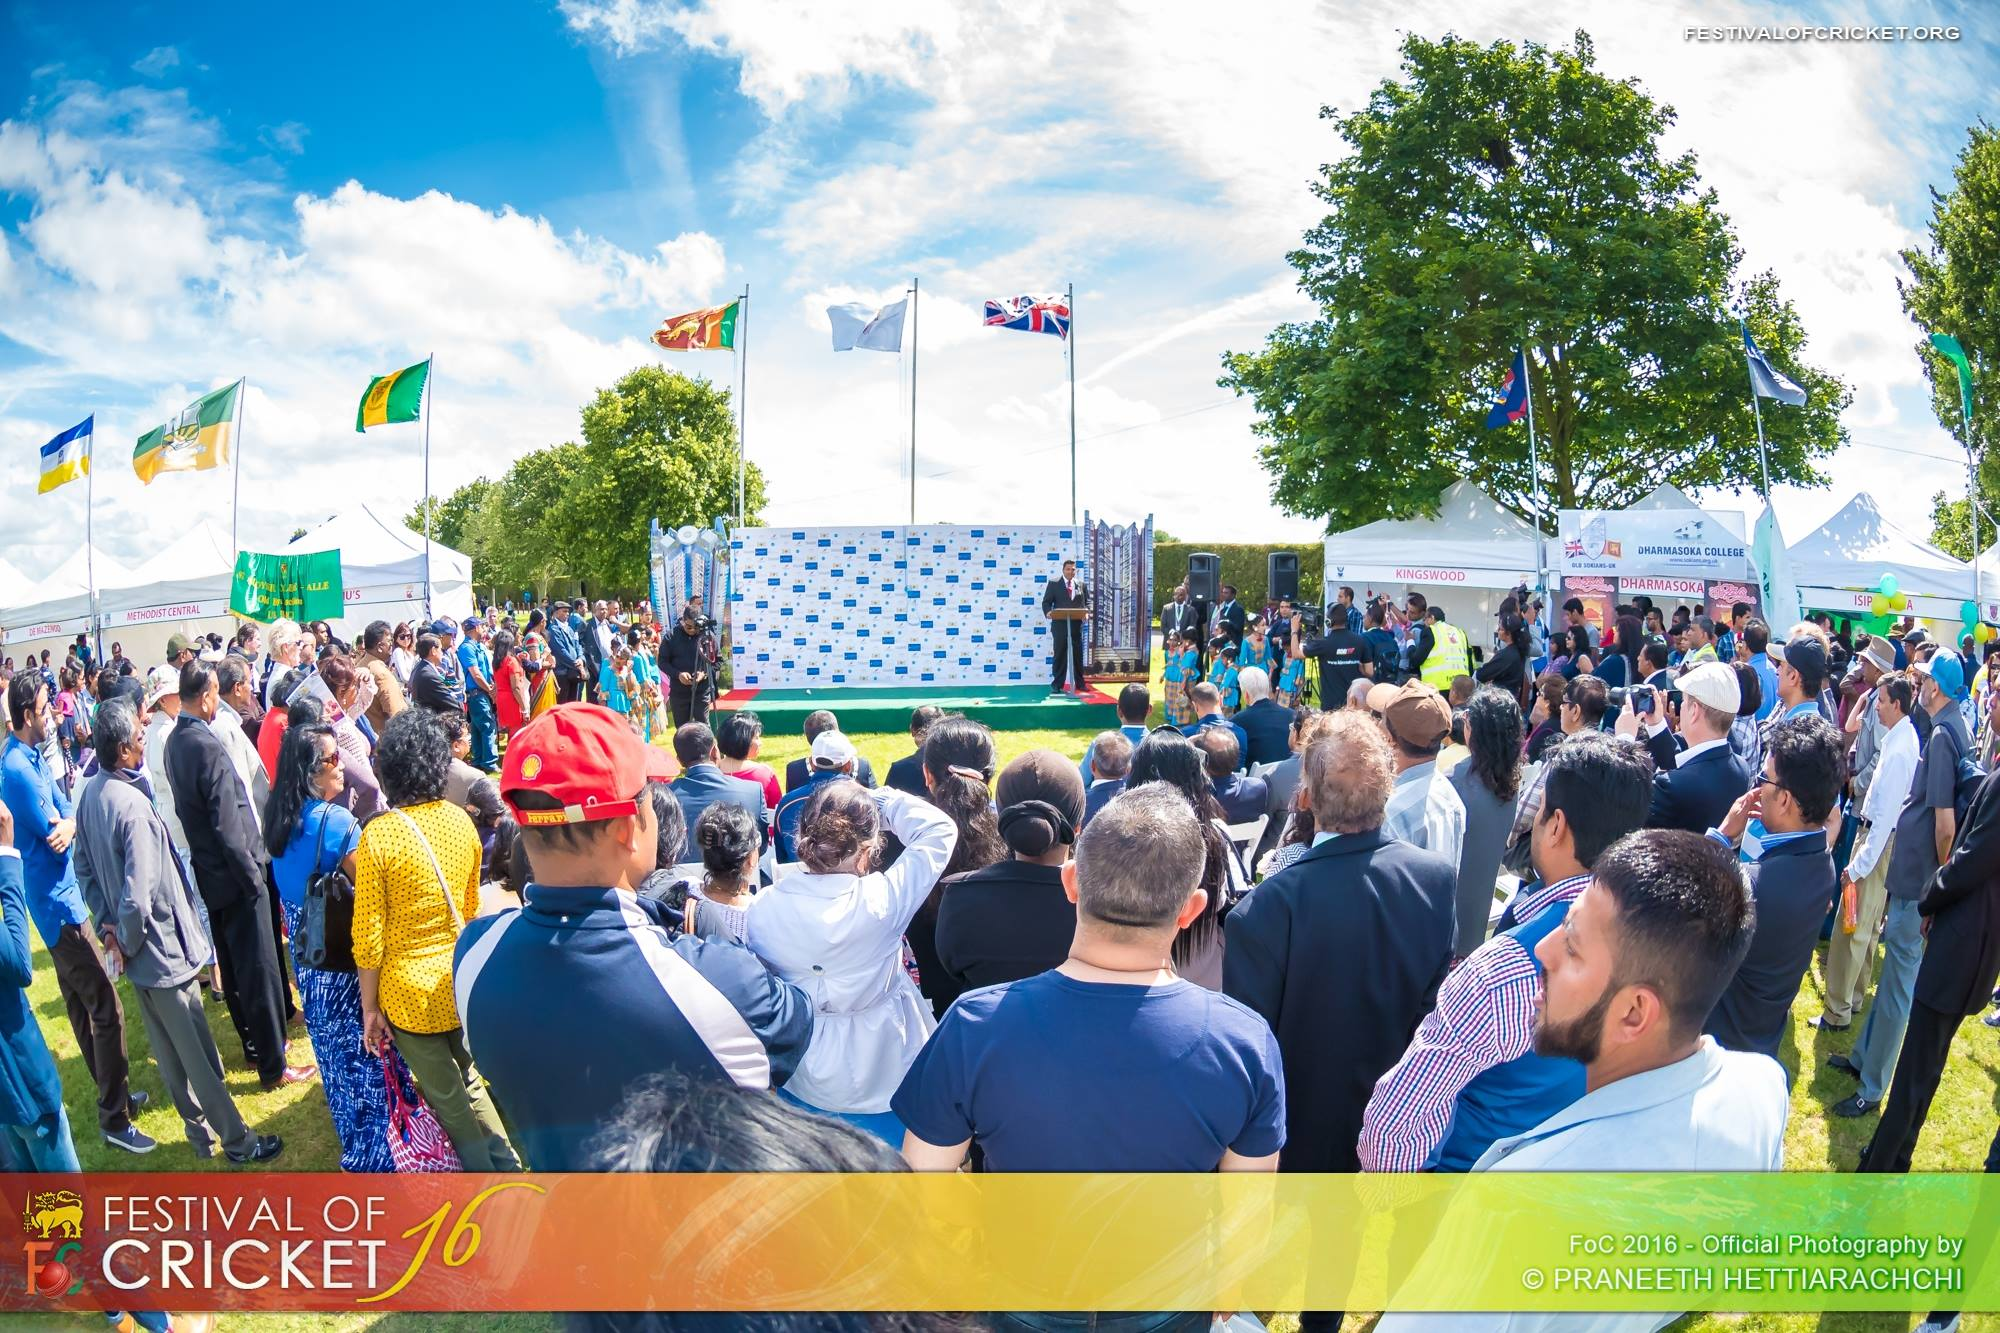 Festival of Cricket 2016